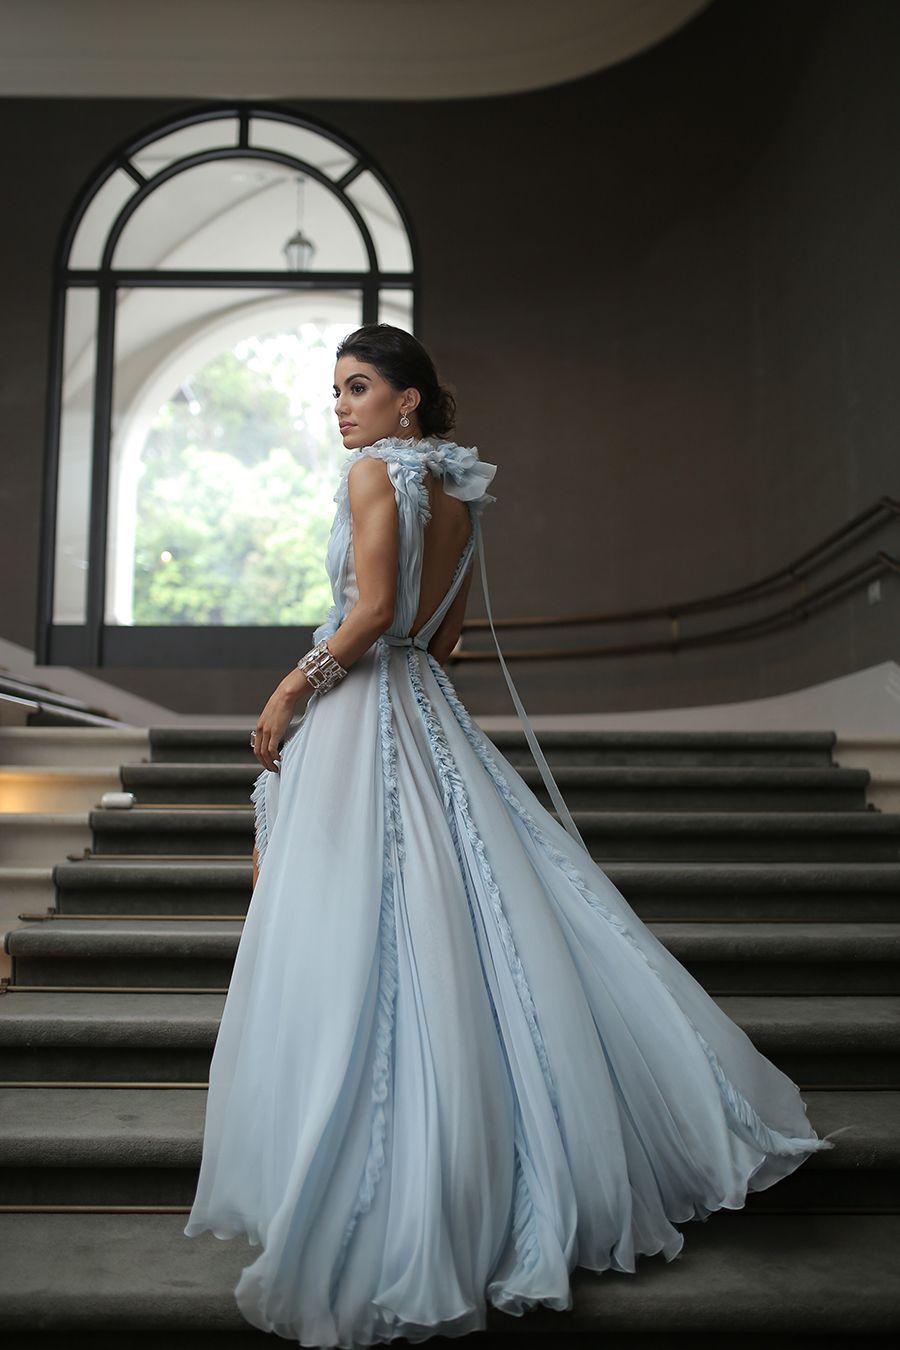 Look: Casamento Marina Ruy Barbosa | Red carpet and Fashion